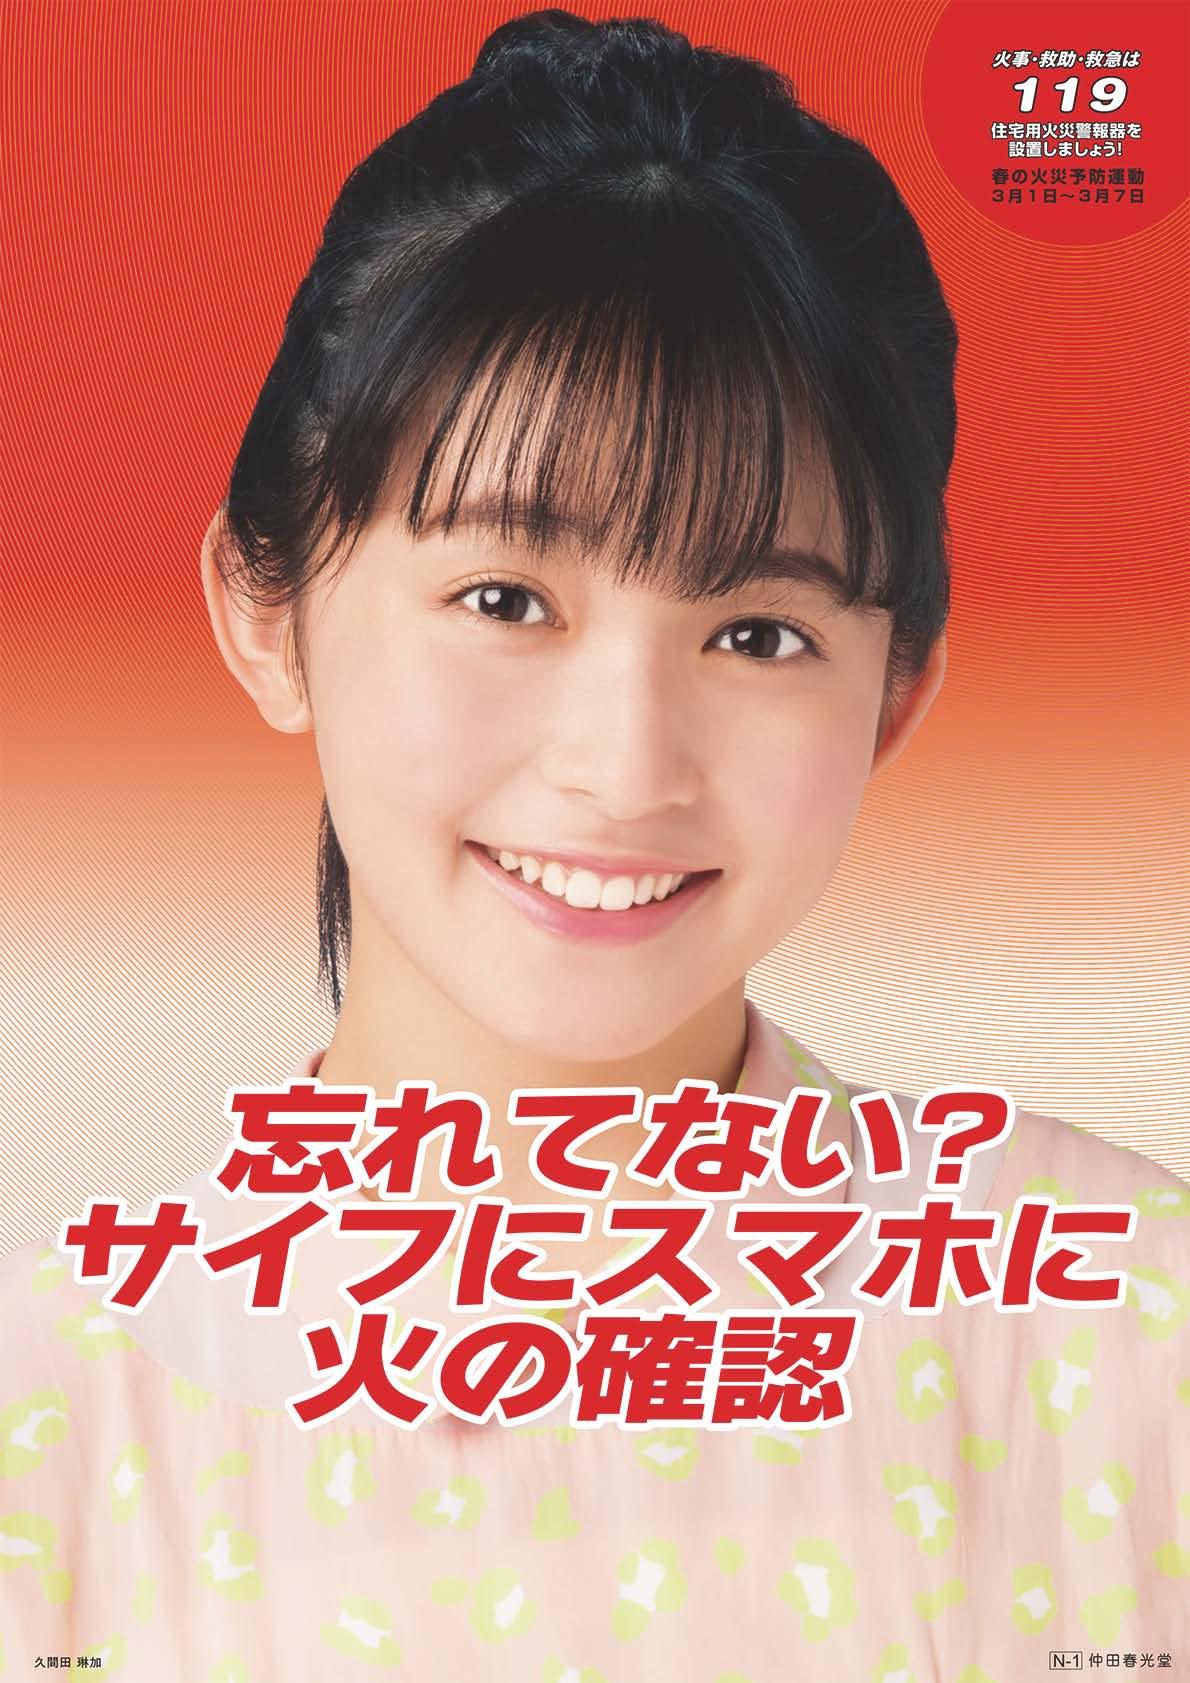 火災予防運動用ポスター等の配布(平成30年秋の火災予防運動用 ...